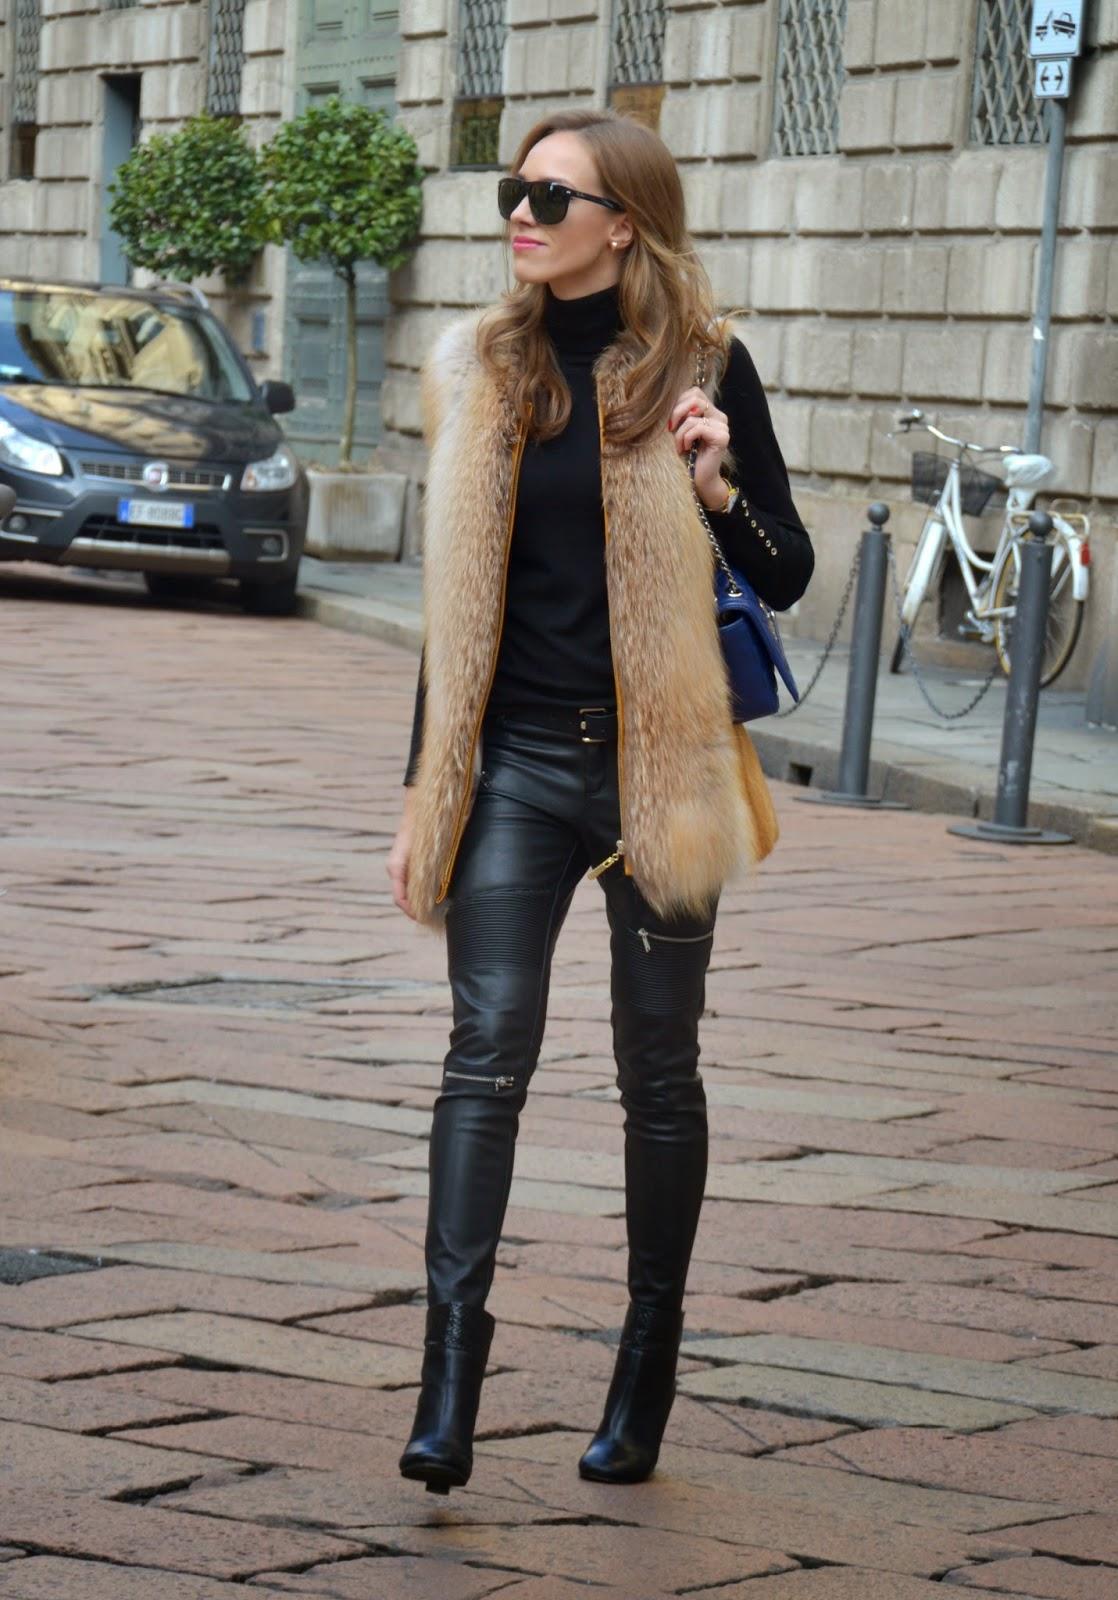 zara-leather-pants-fur-vest-winter-outfit-milan kristjaana mere